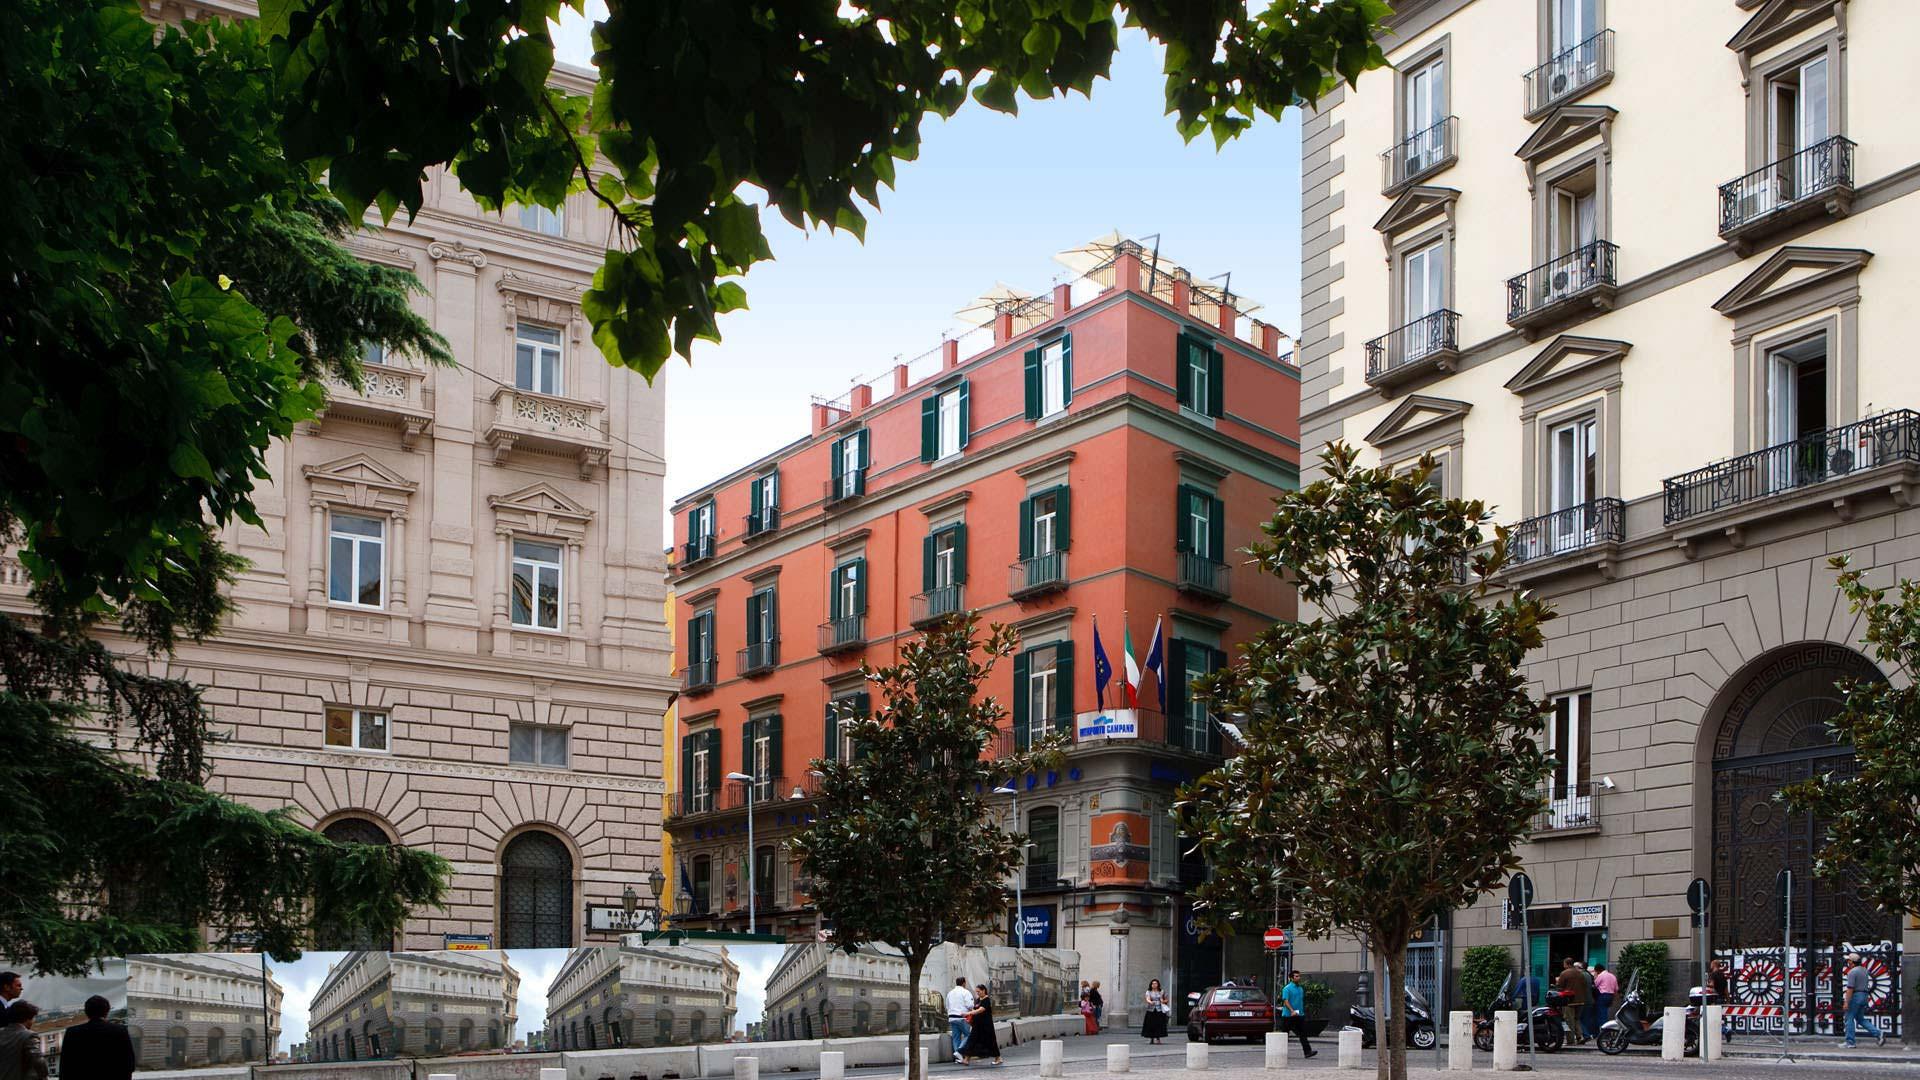 La Ciliegina Lifestyle Hotel Naples, vue de la piazza municipio